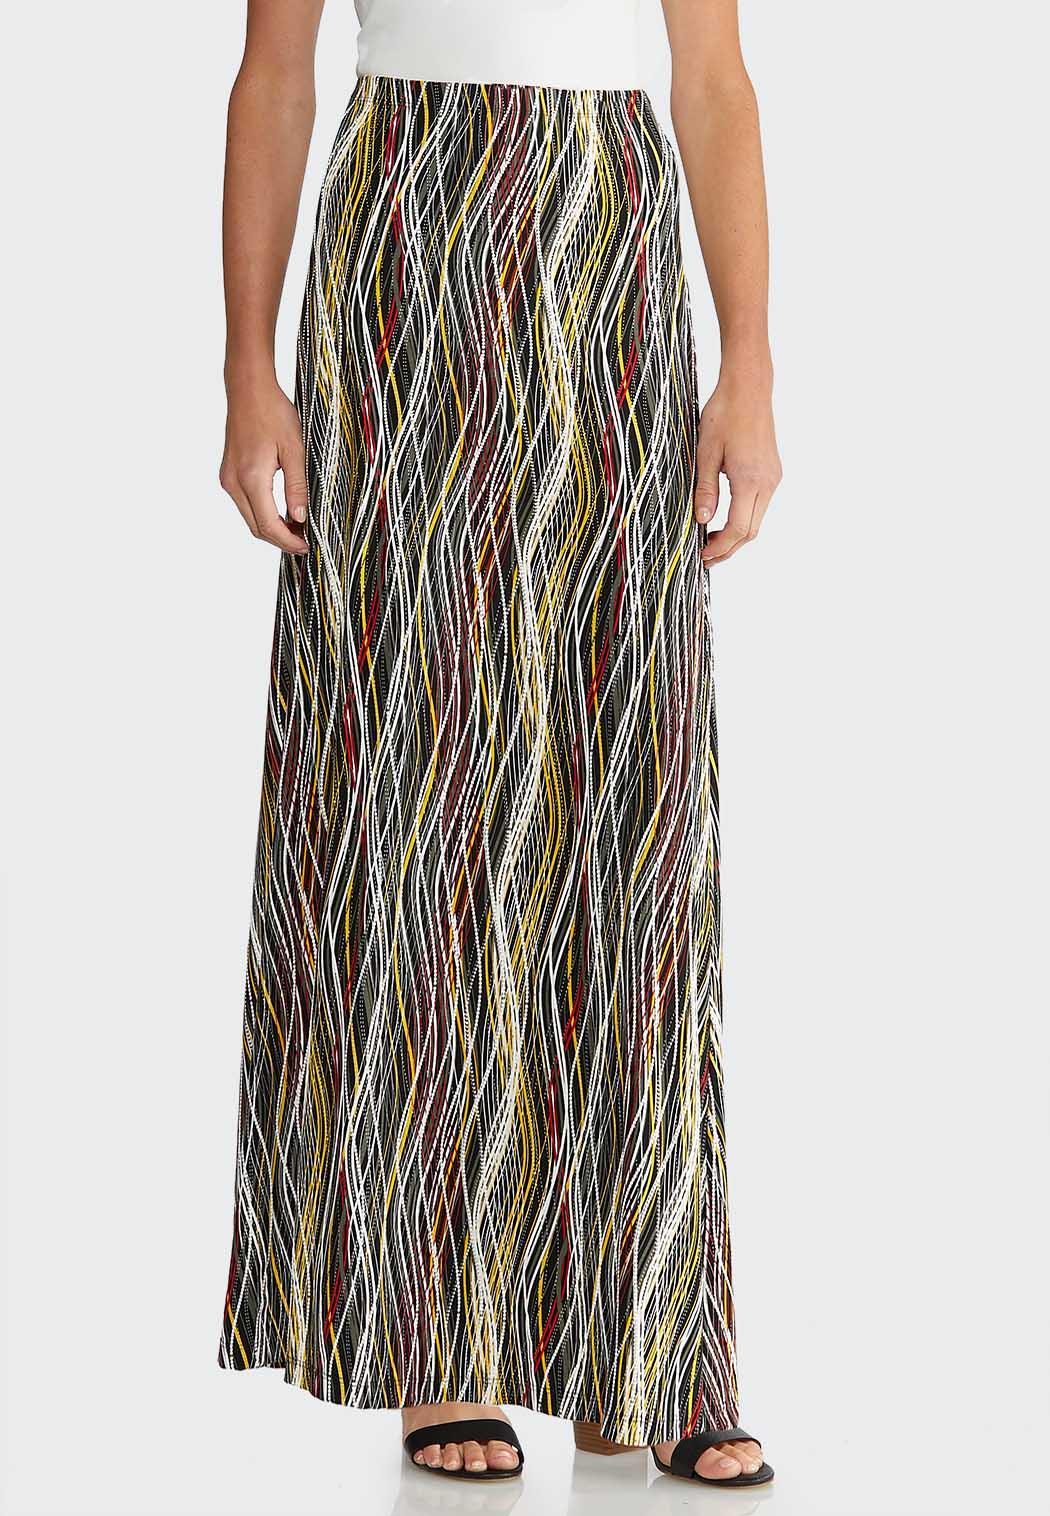 Plus Size Puff Wavy Maxi Skirt